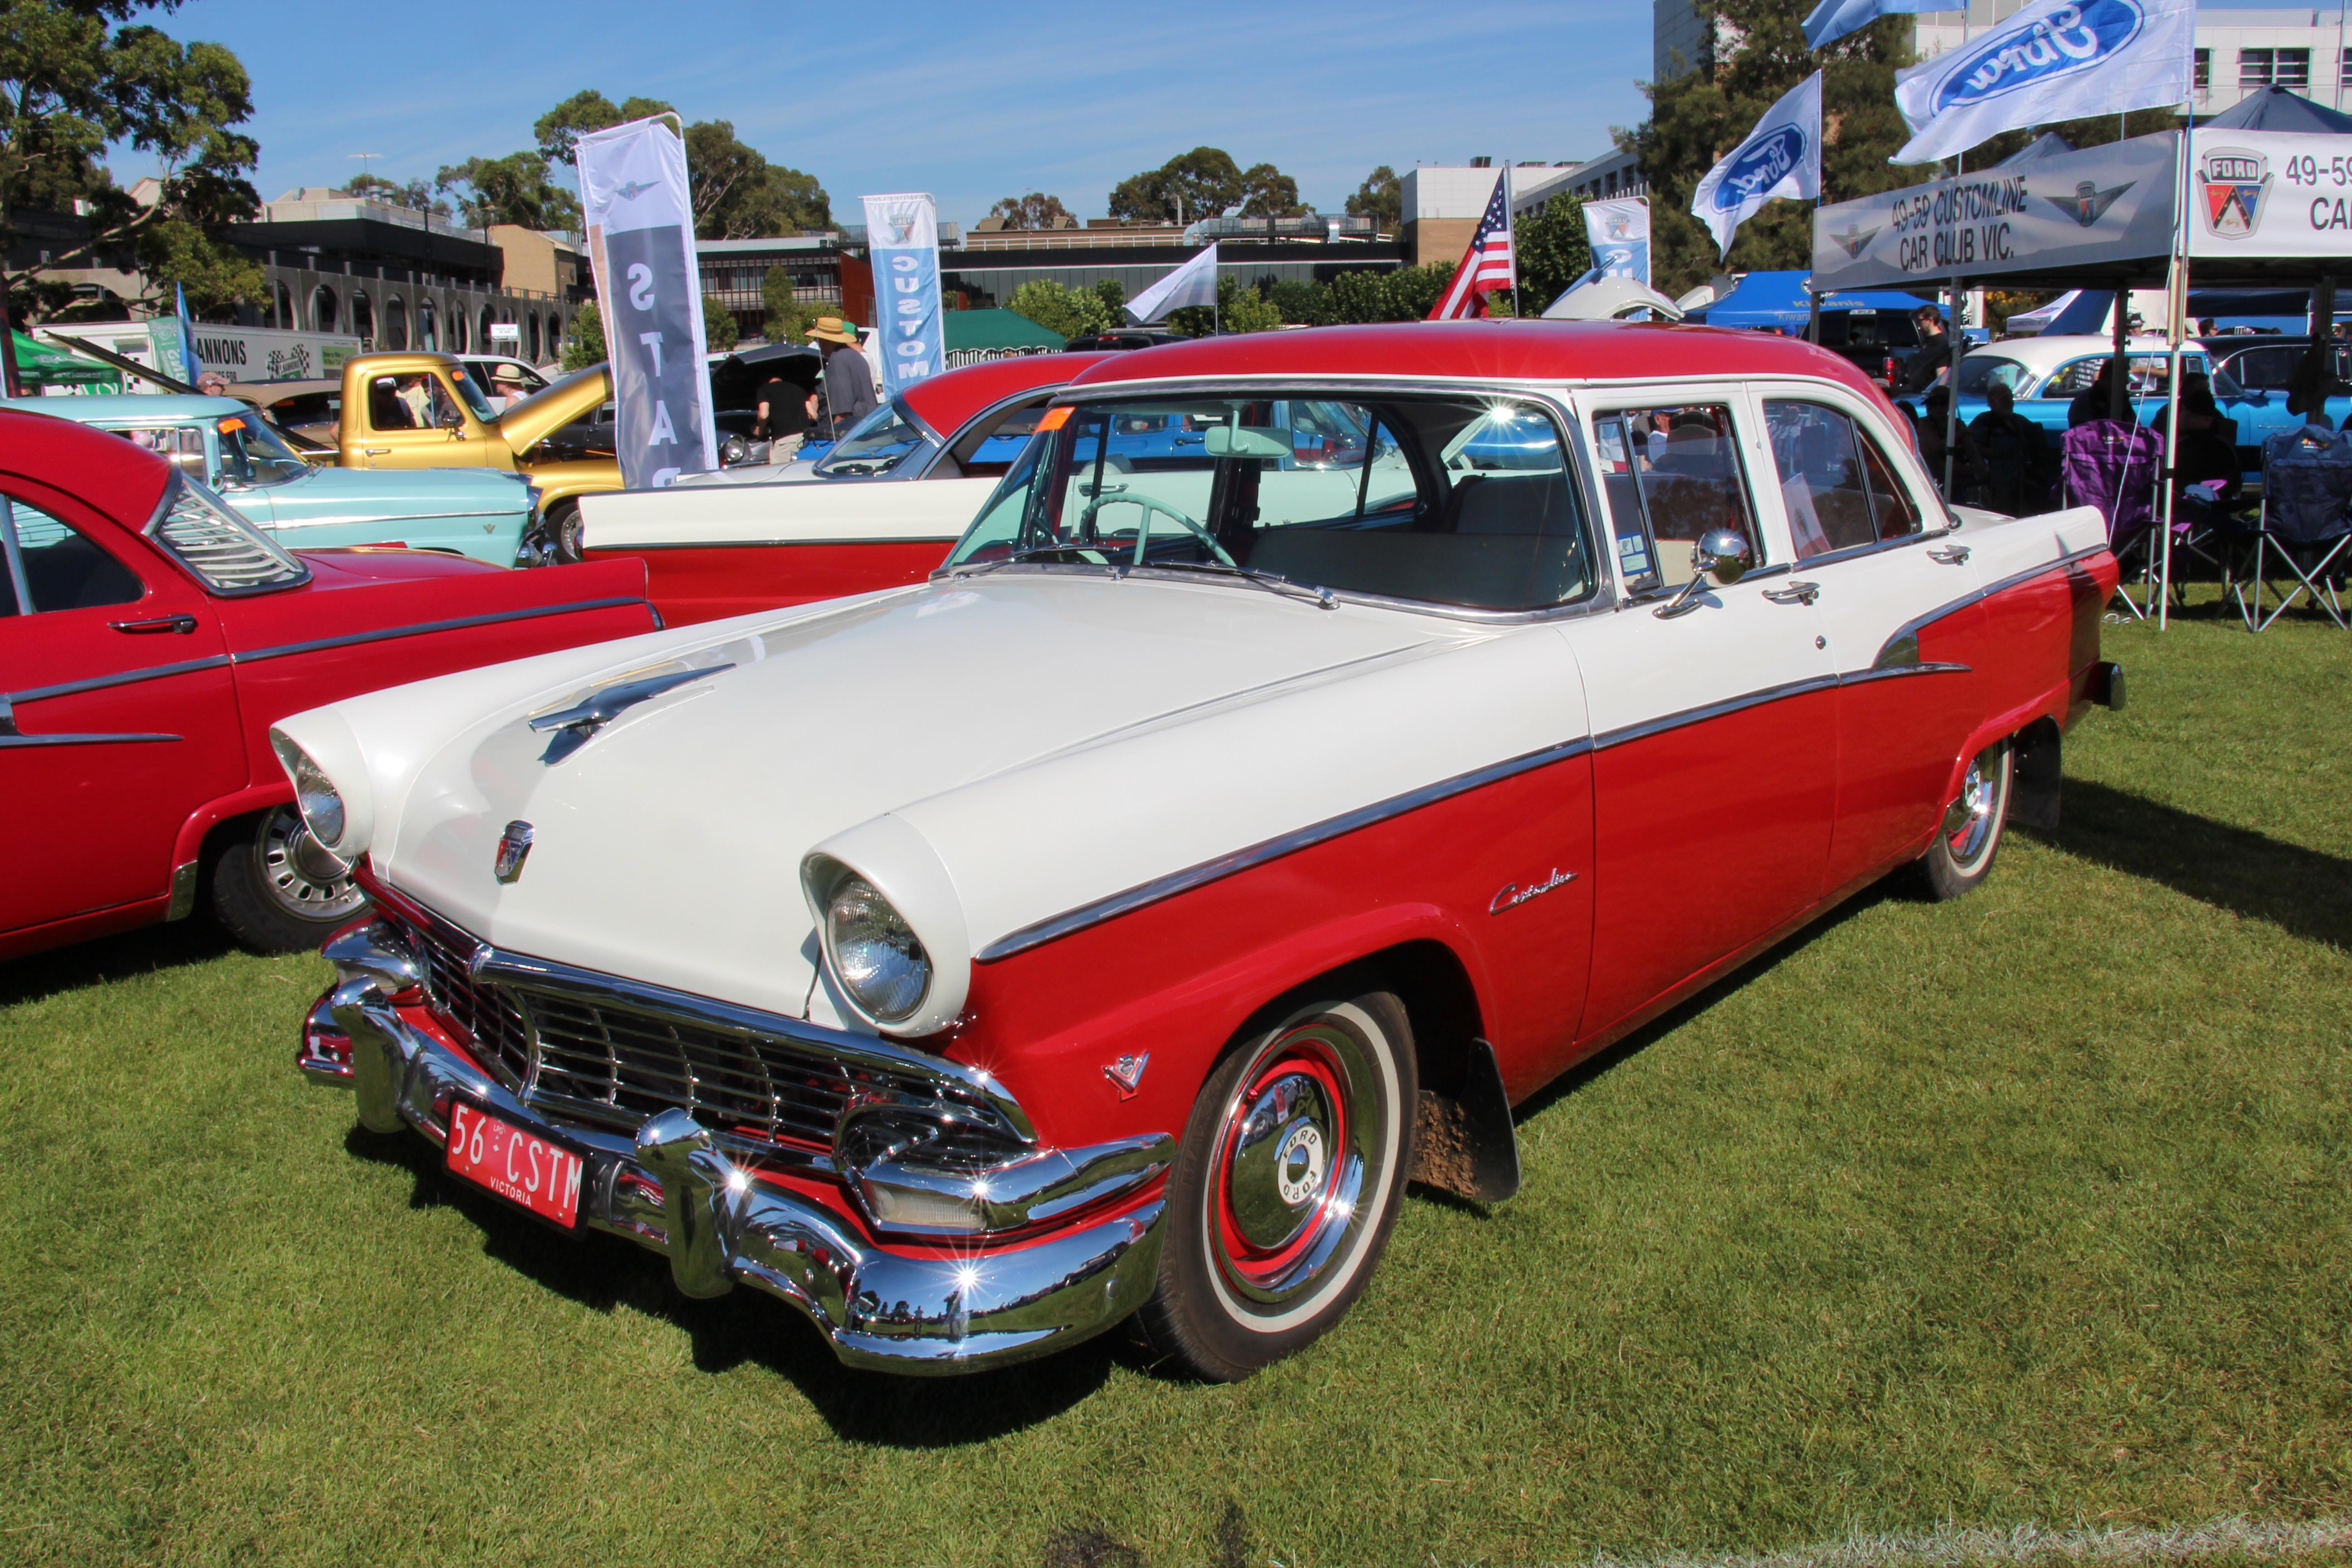 File1956 Ford Customline (Australia).jpg & File:1956 Ford Customline (Australia).jpg - Wikimedia Commons markmcfarlin.com